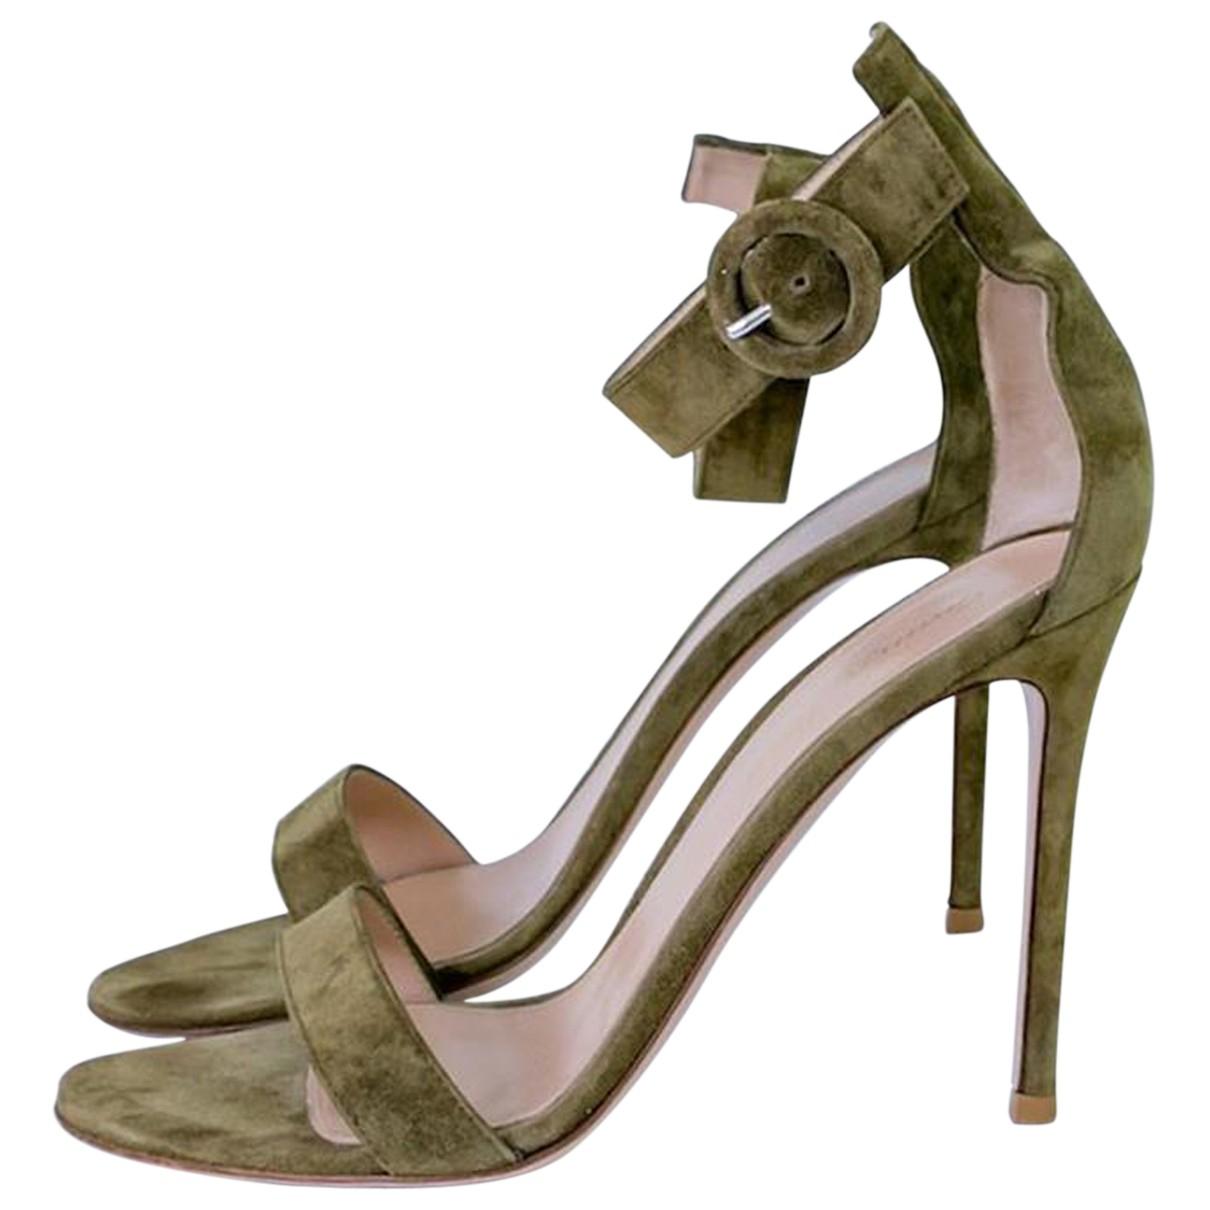 Gianvito Rossi - Sandales   pour femme en suede - vert